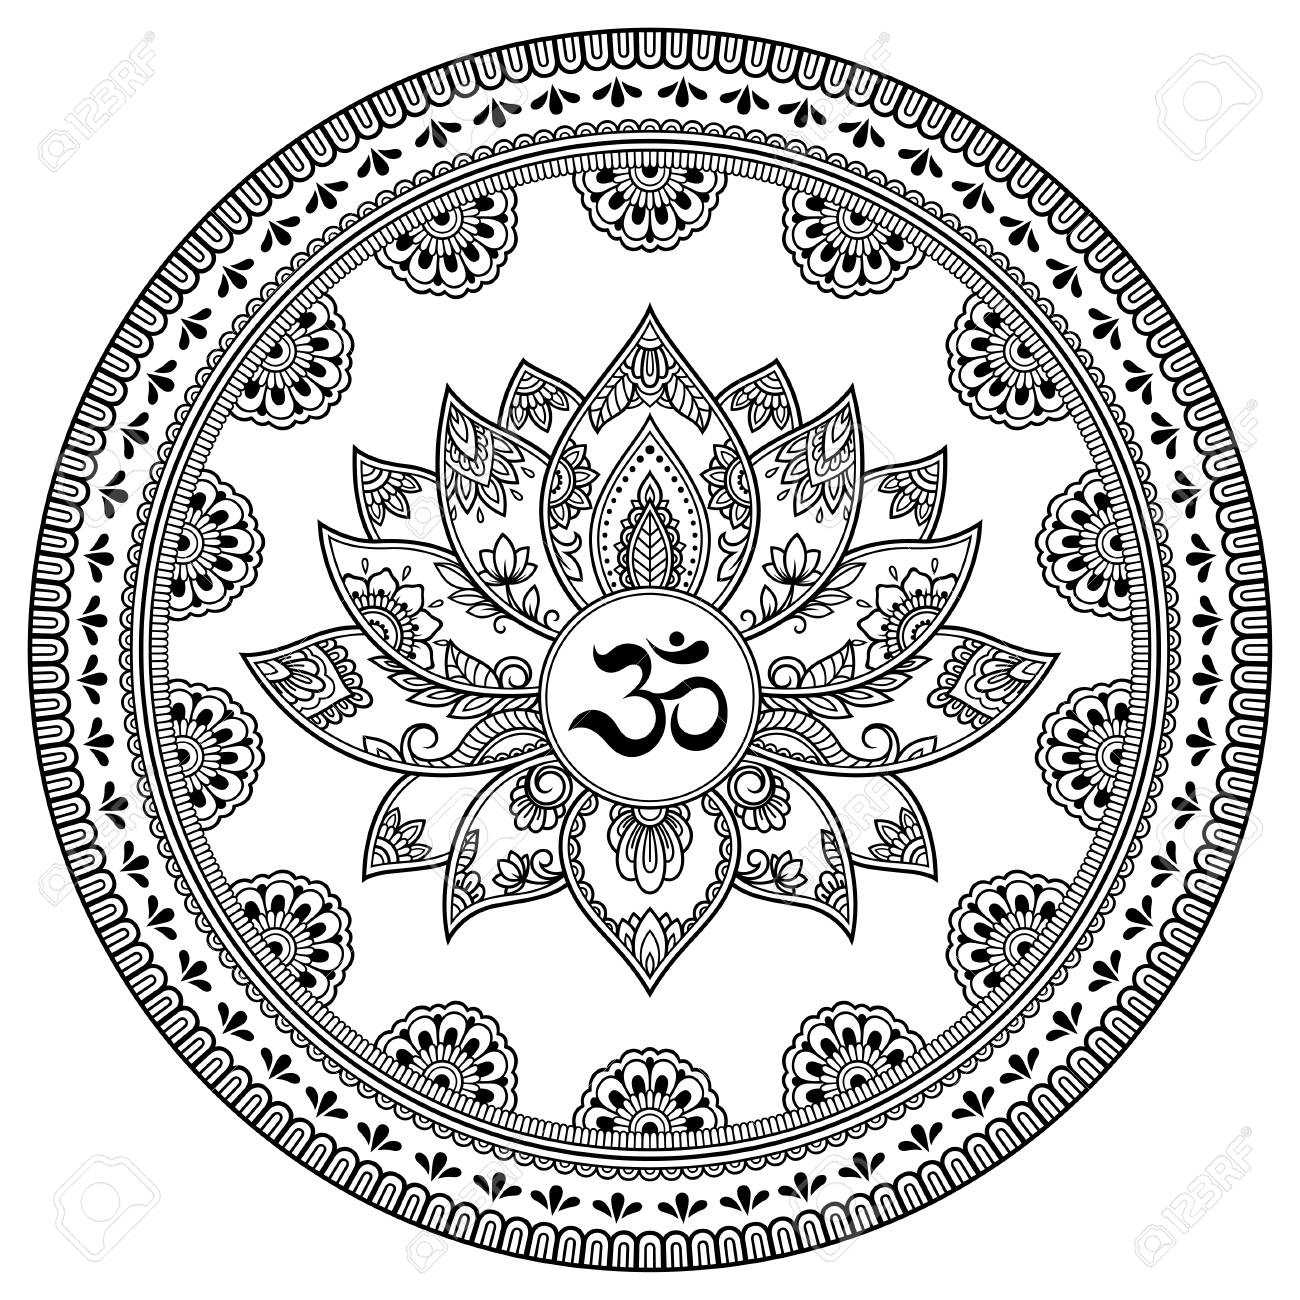 Circular pattern in form of mandala with lotus flower for henna circular pattern in form of mandala with lotus flower for henna mehndi tattoo mightylinksfo